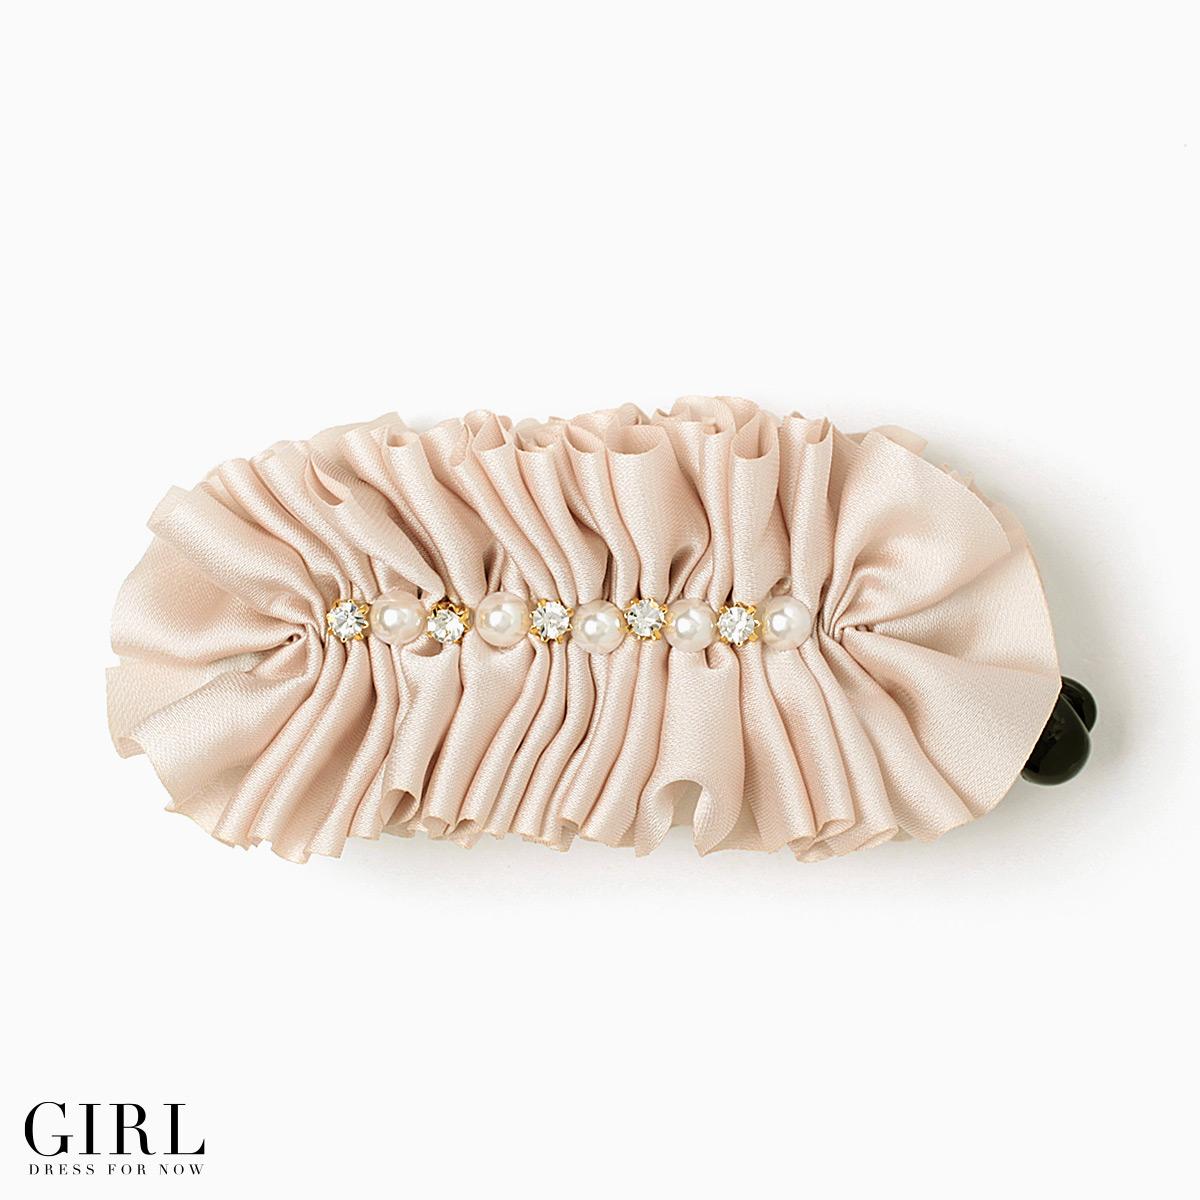 Dress shop GIRL | Rakuten Global Market: ☆ cool & cute banana ...